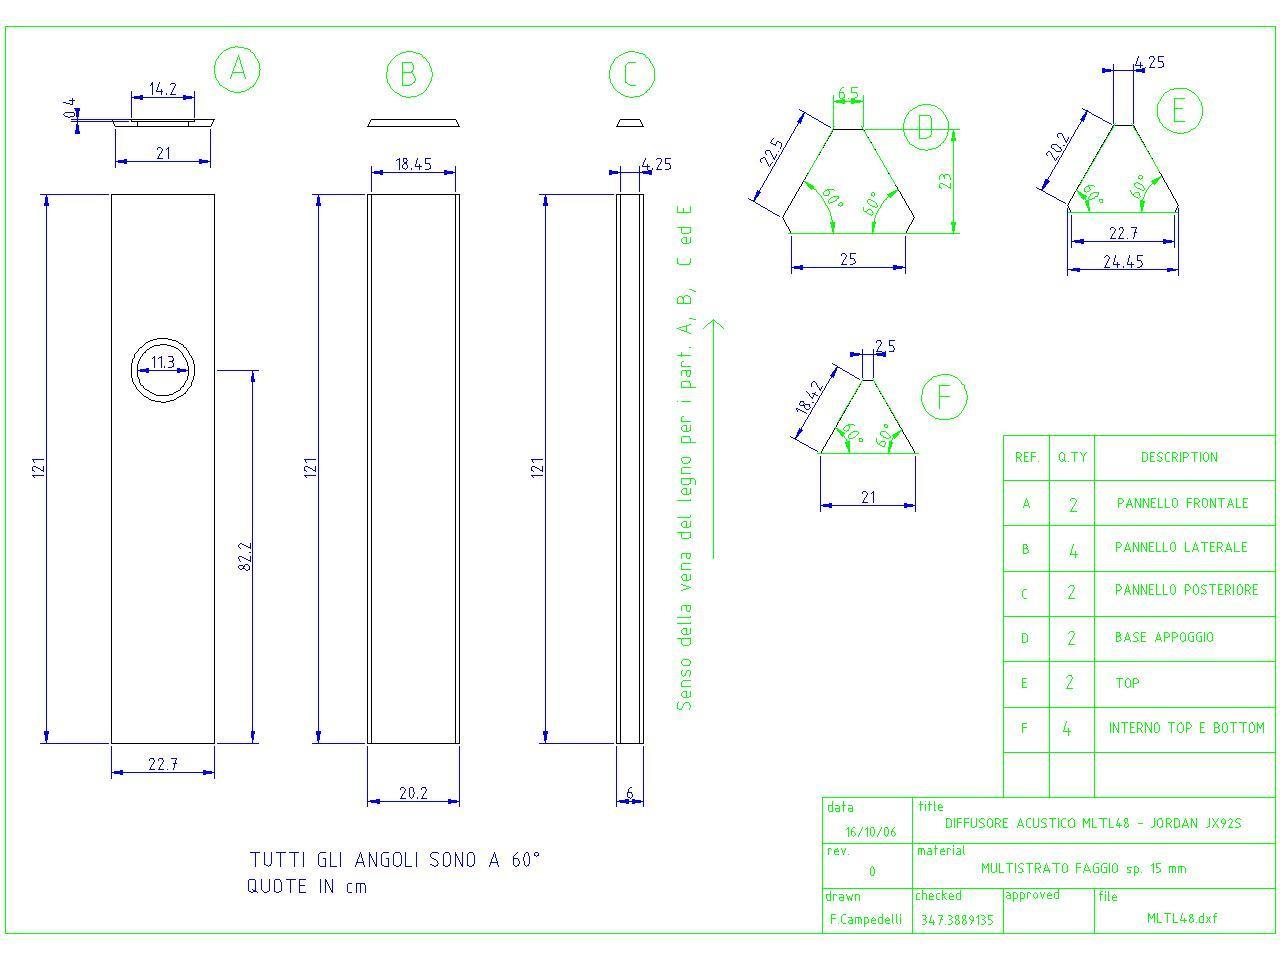 Transmission Line Loudspeaker Design Software – Migliori Pagine da